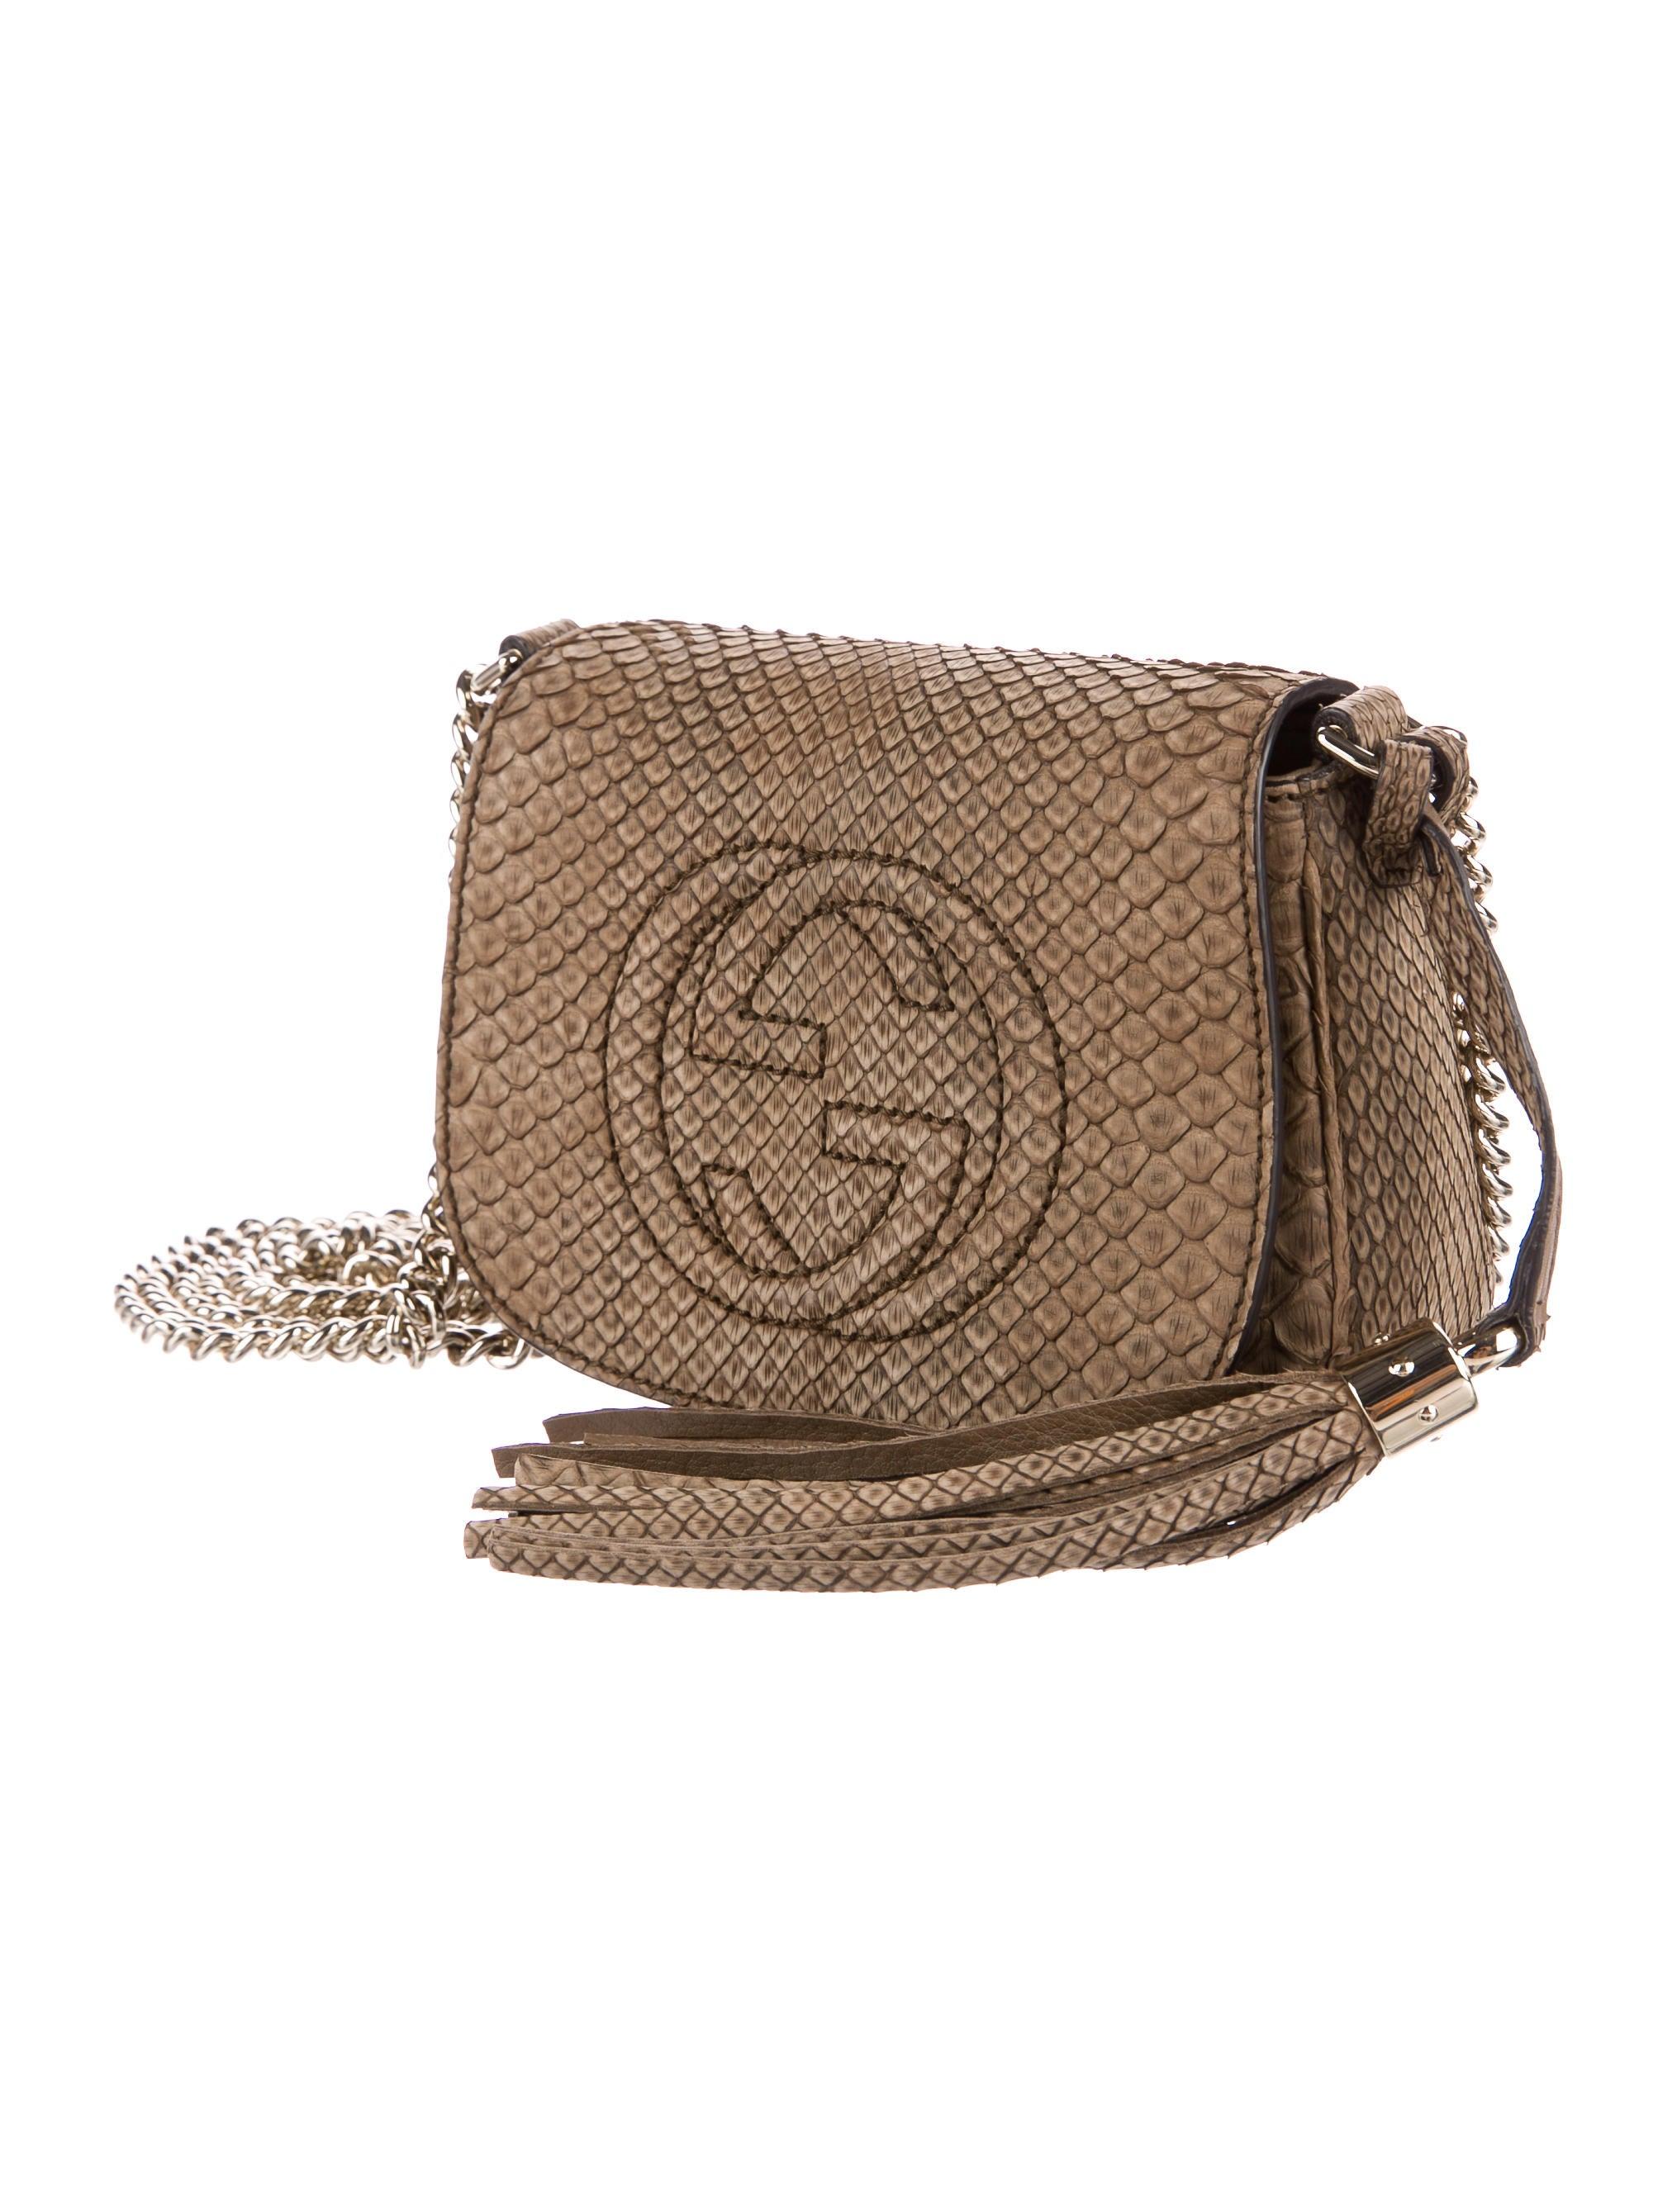 e994b47ed33a Gucci Python Soho Chain Crossbody Bag - Handbags - GUC163309 | The RealReal